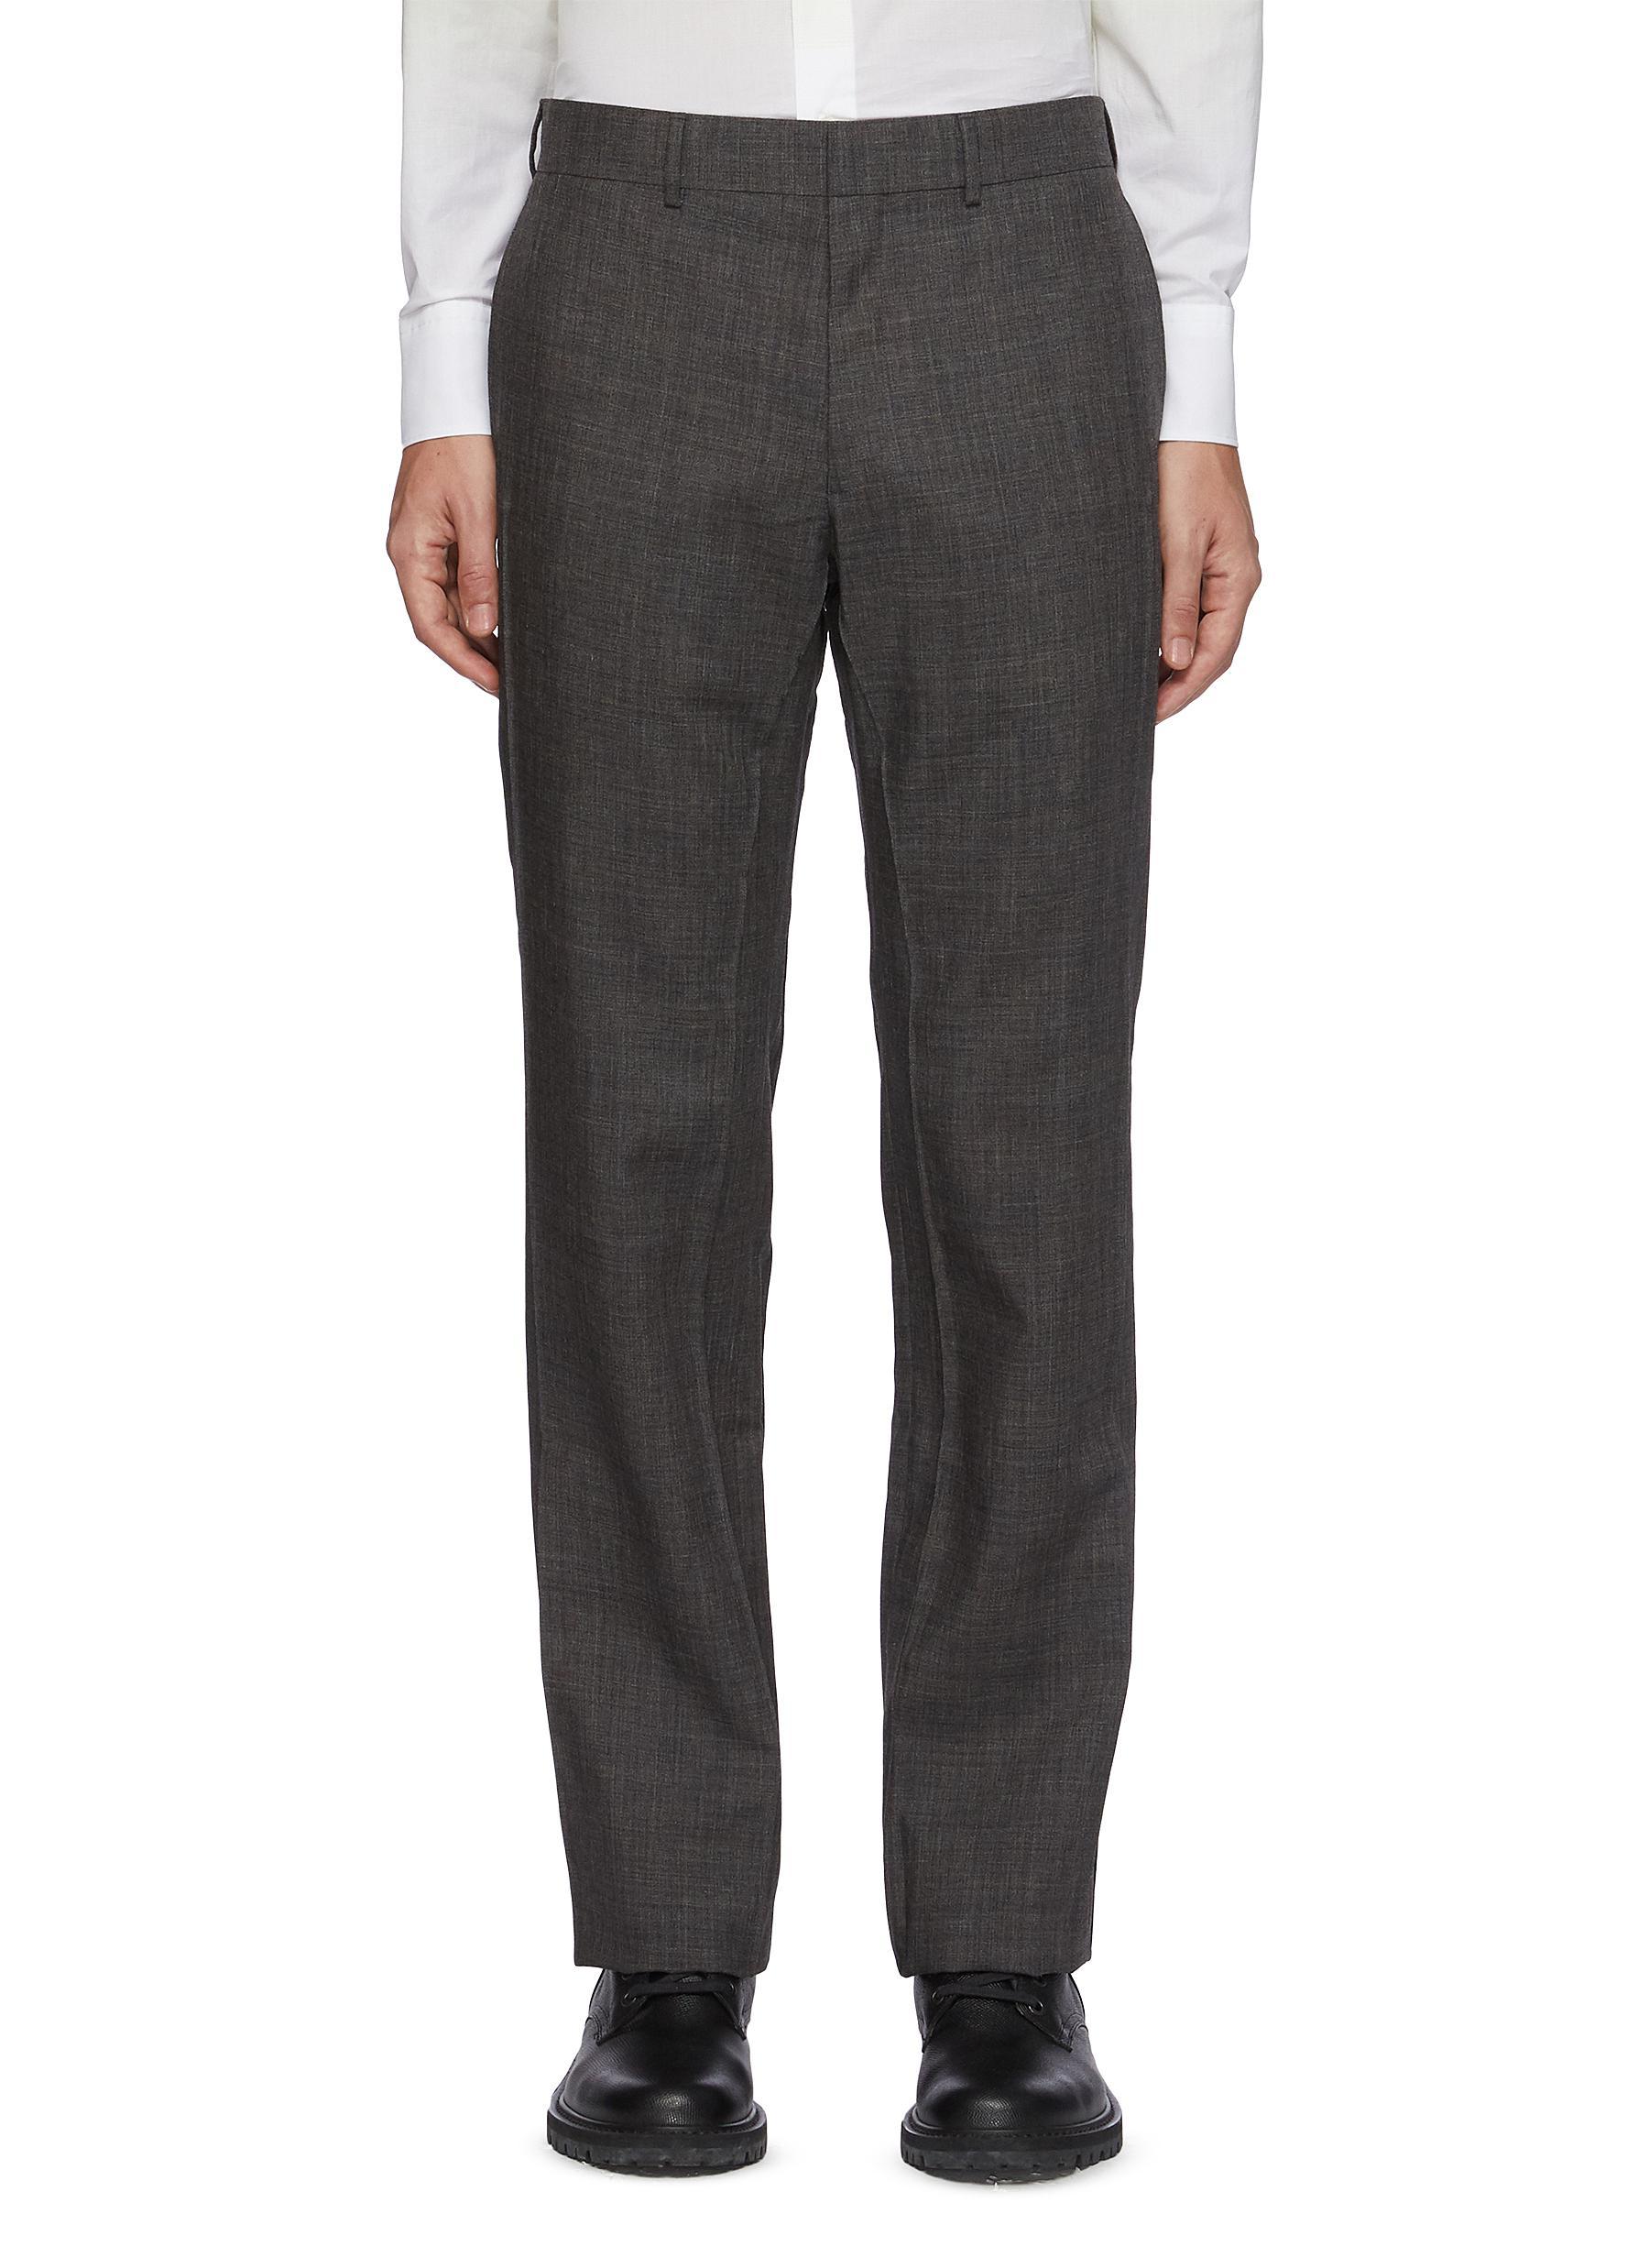 'Cuboid' Wool mohair blend tailored pants